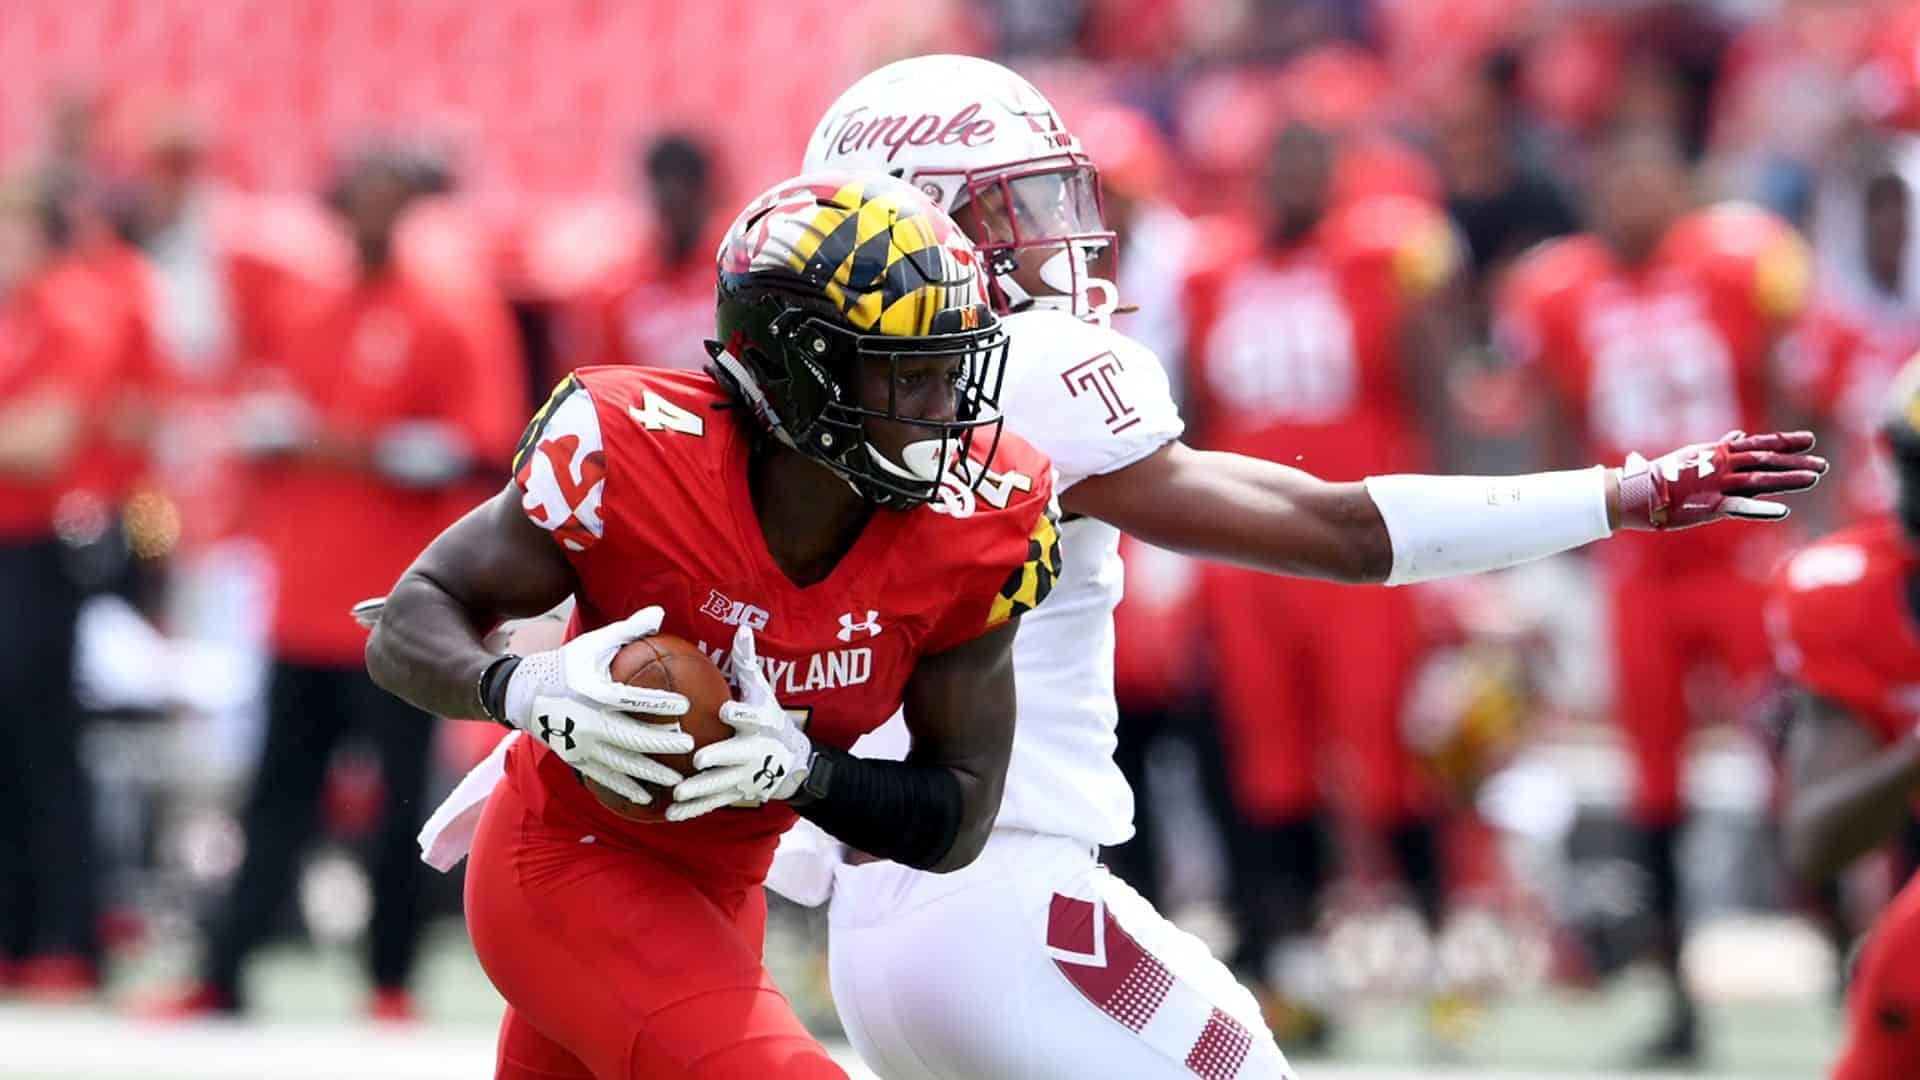 Darnell Savage - 2019 NFL Draft